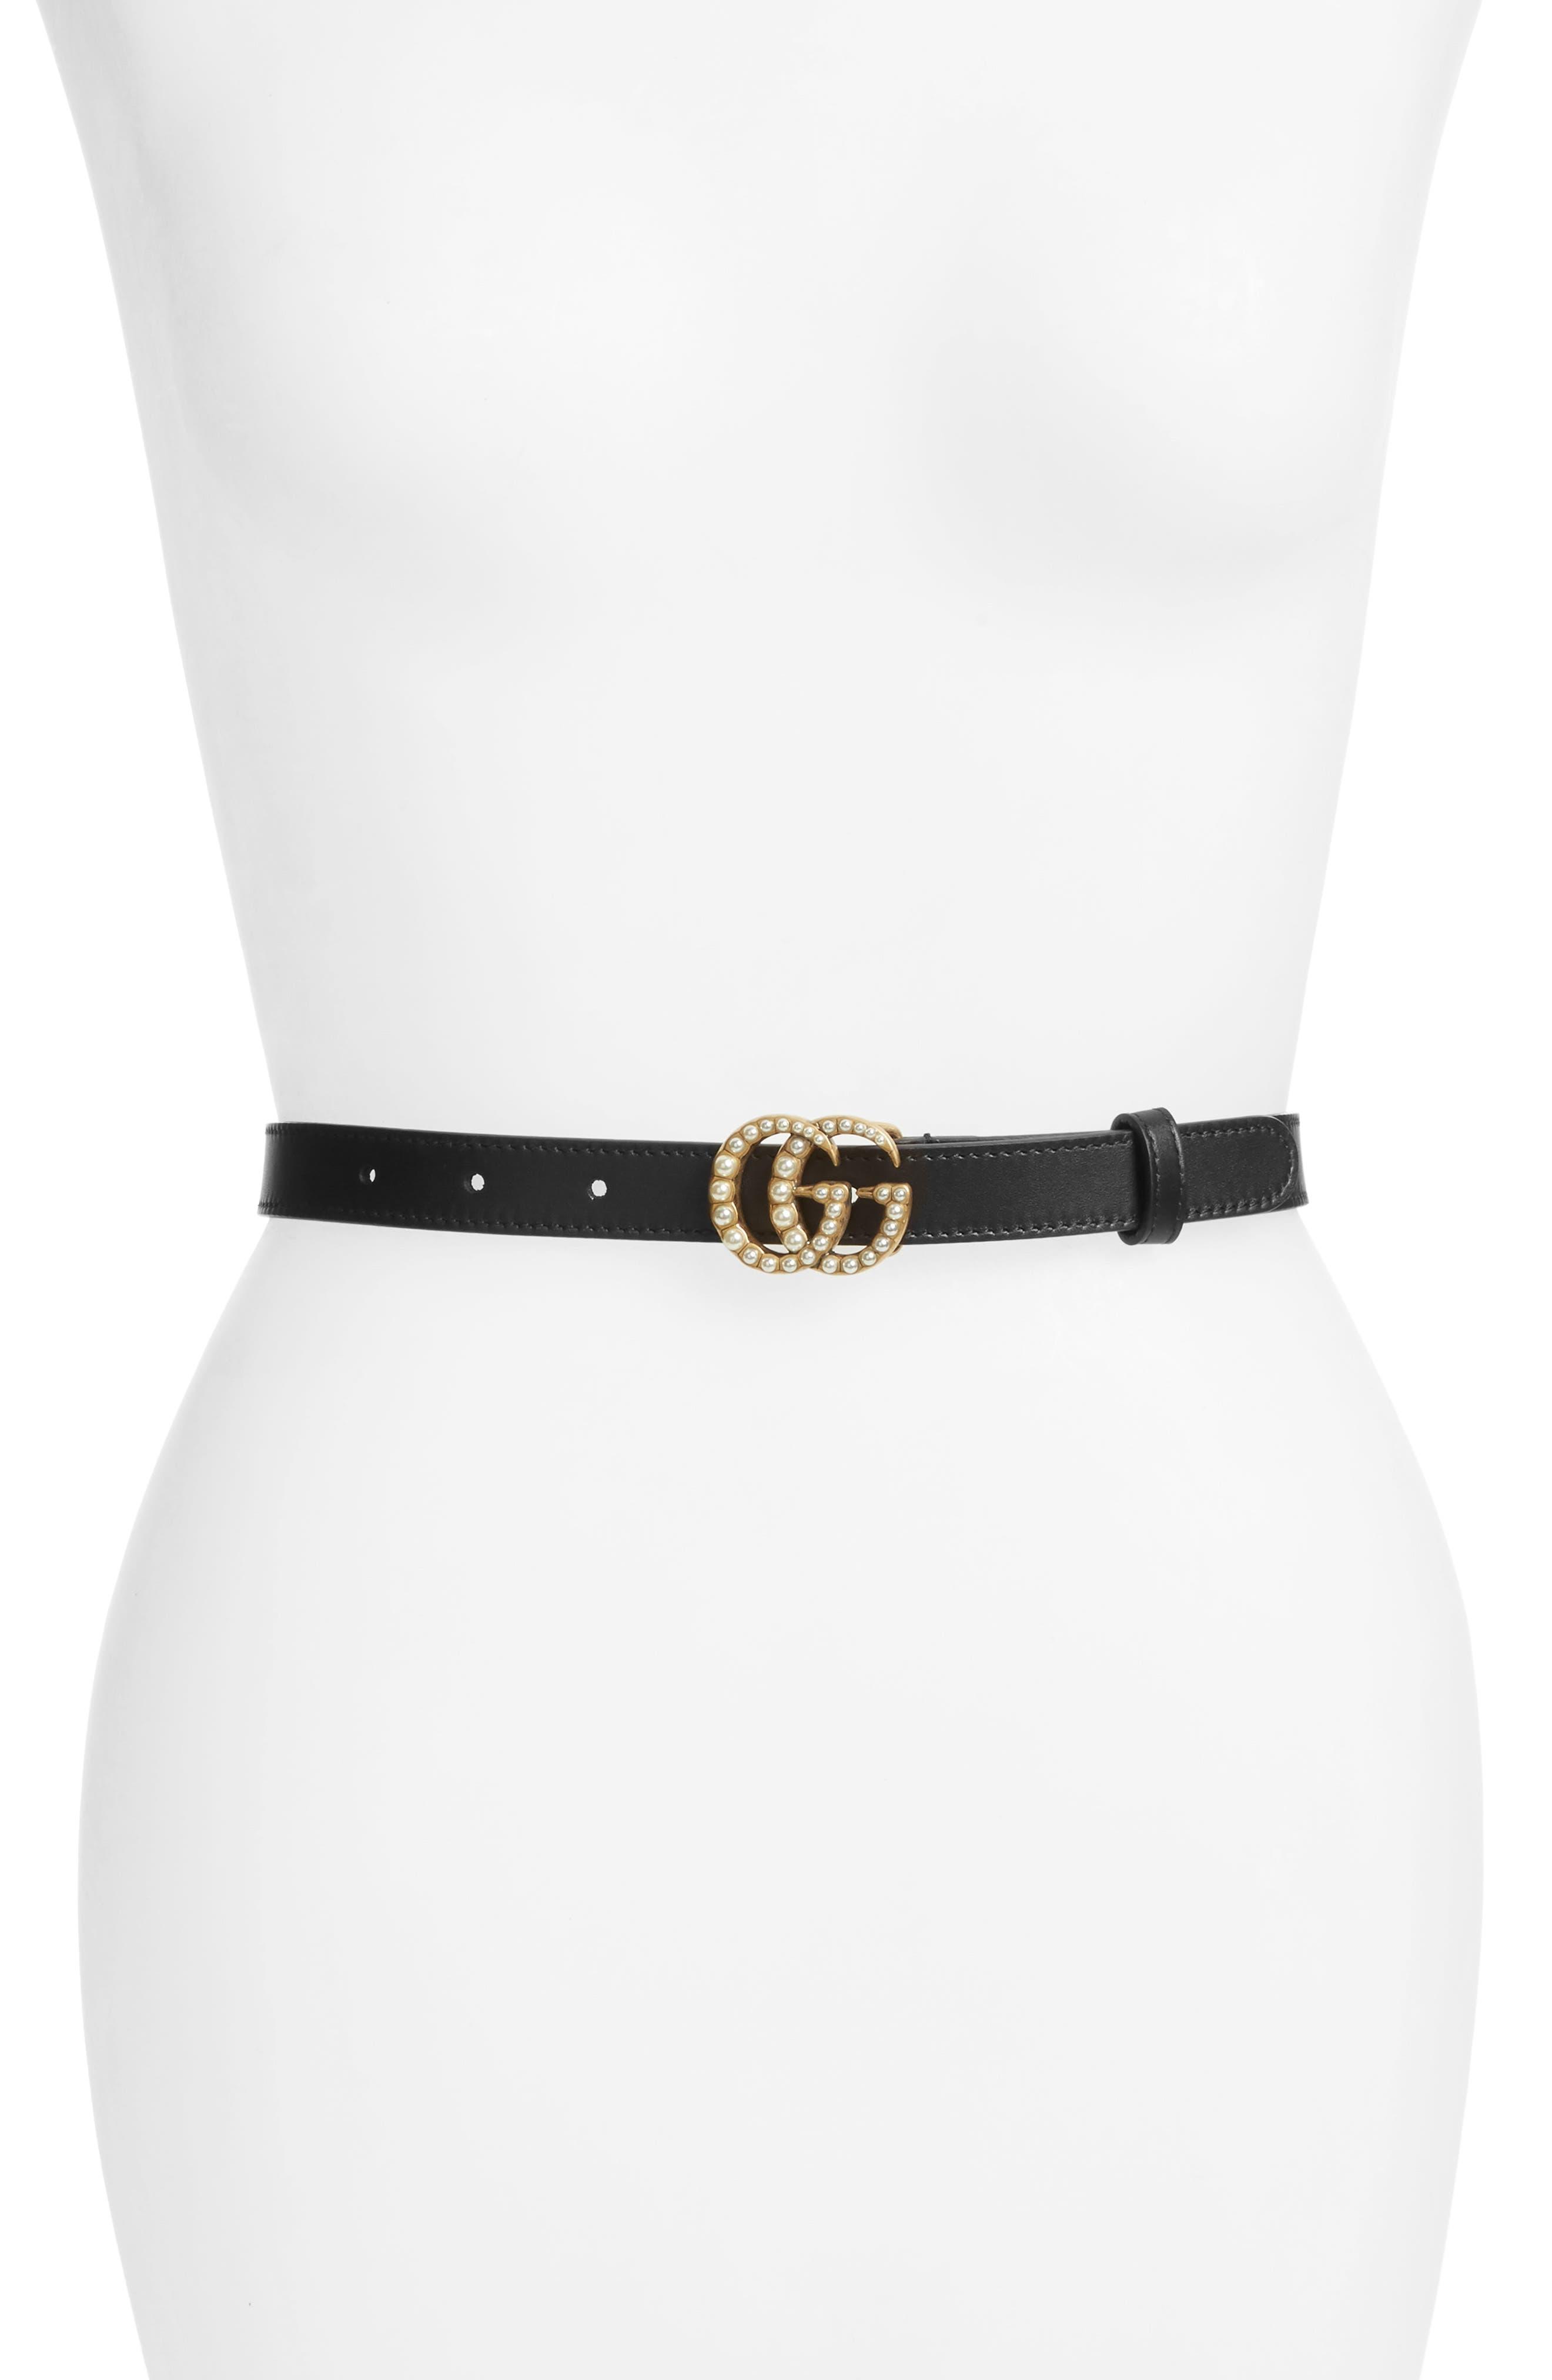 Calfskin Leather Skinny Belt,                             Main thumbnail 1, color,